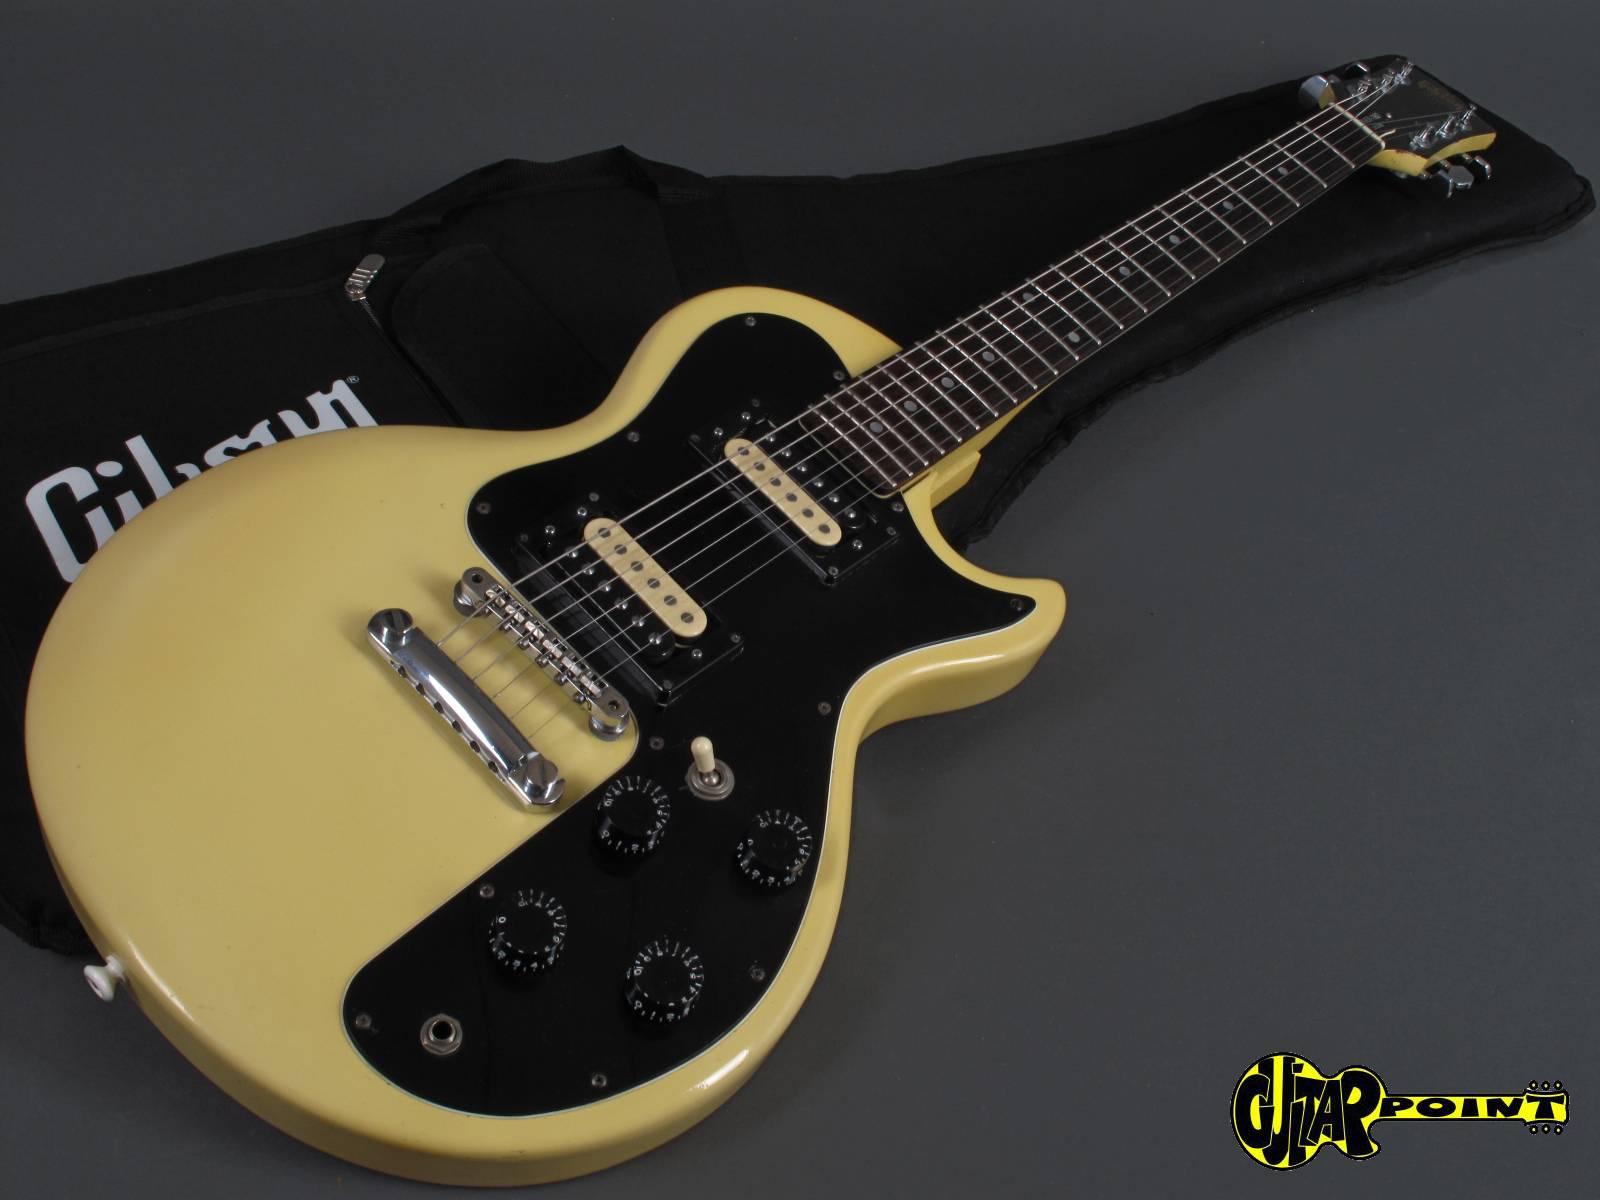 Gibson Sonex 180 Deluxe 1981 White Guitar For Sale GuitarPoint